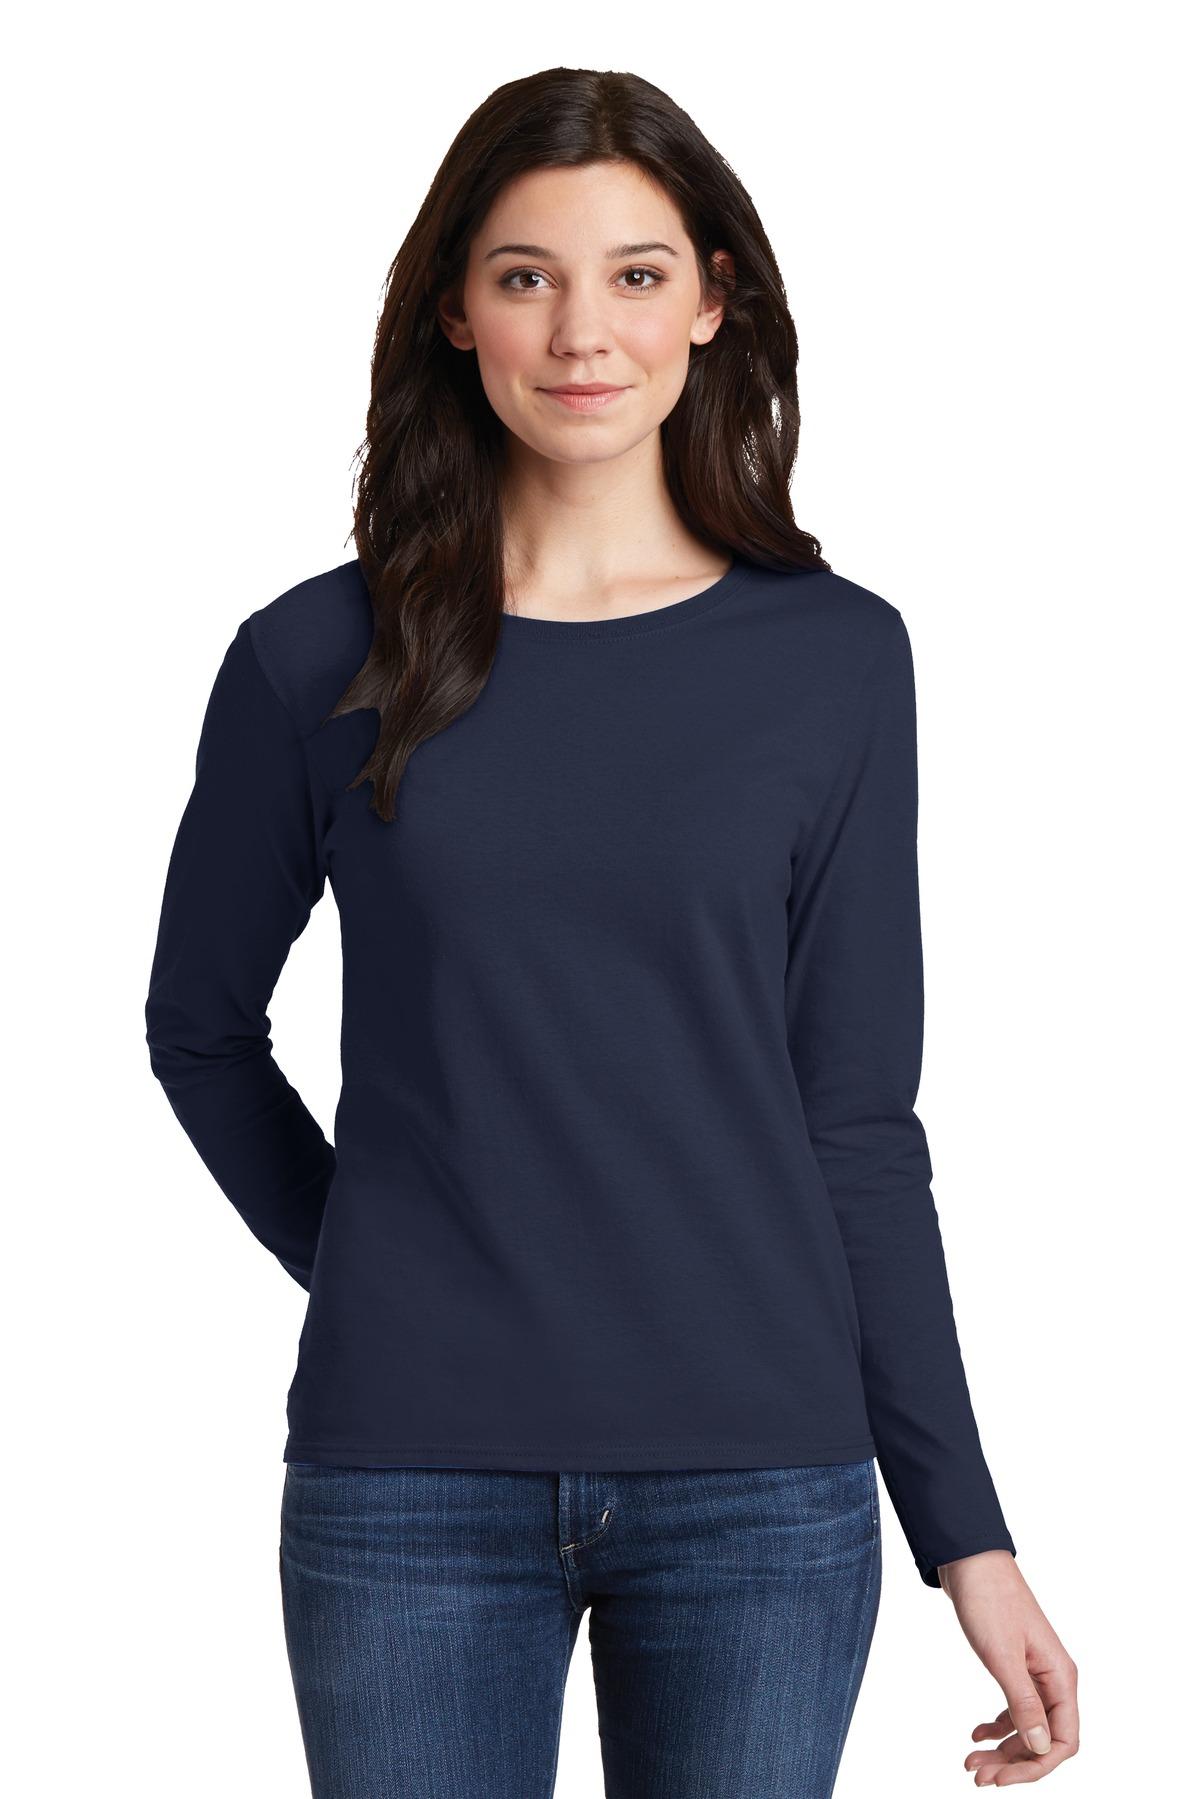 Gildan® Ladies Heavy Cotton 100% Cotton Long Sleeve T-Shirt.-Gildan